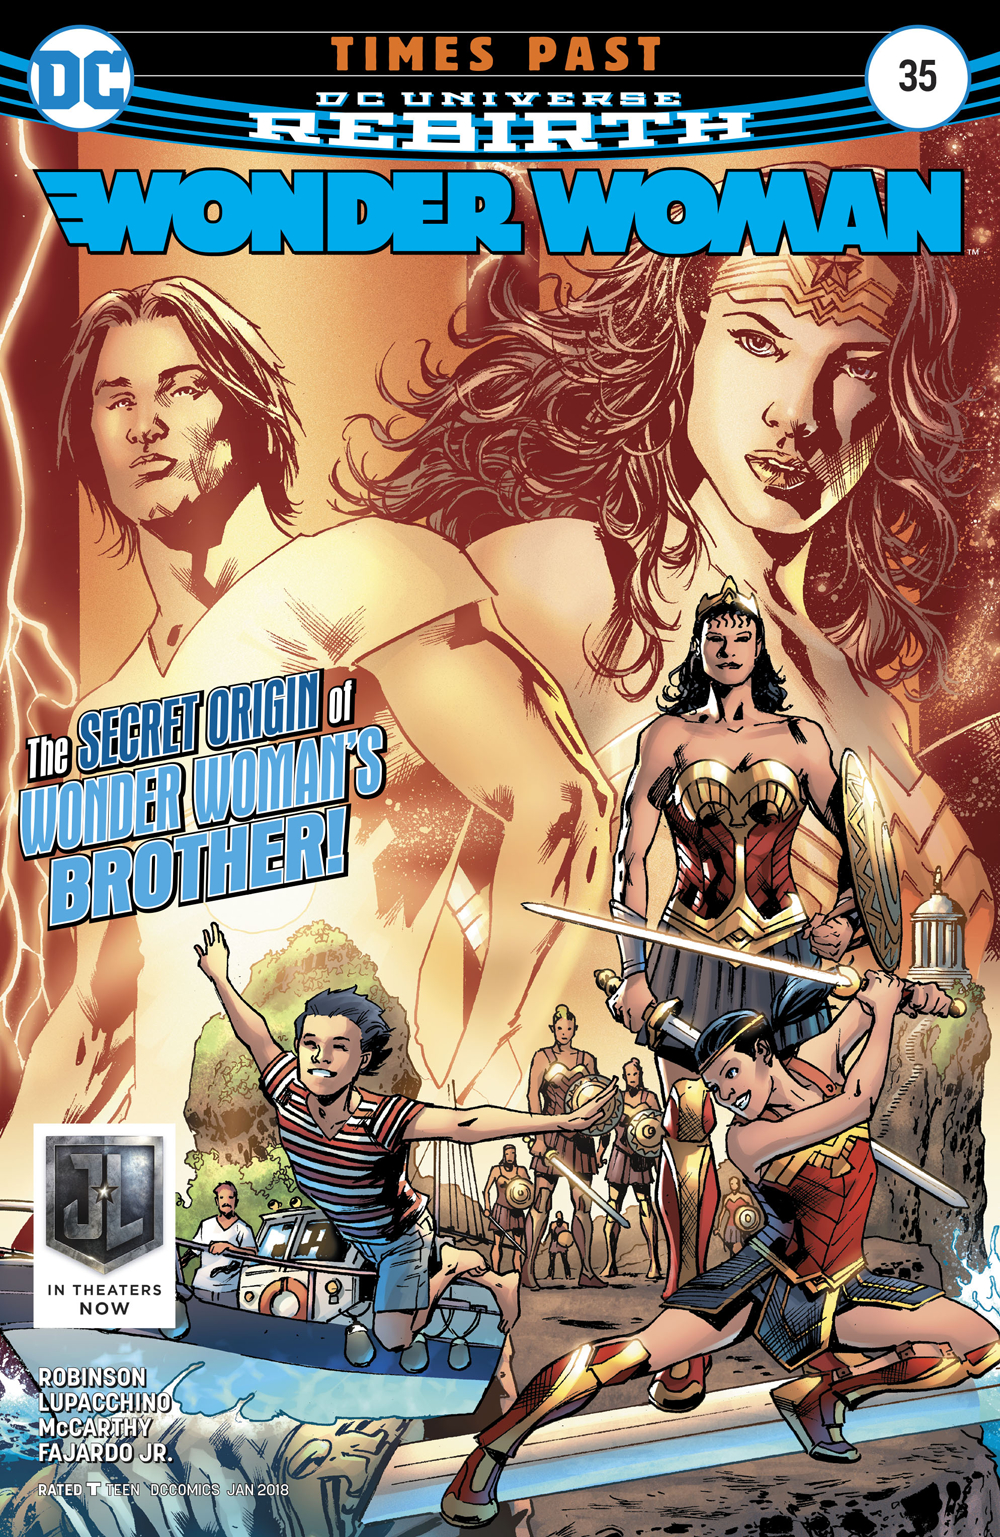 Wonder Woman 35.jpg